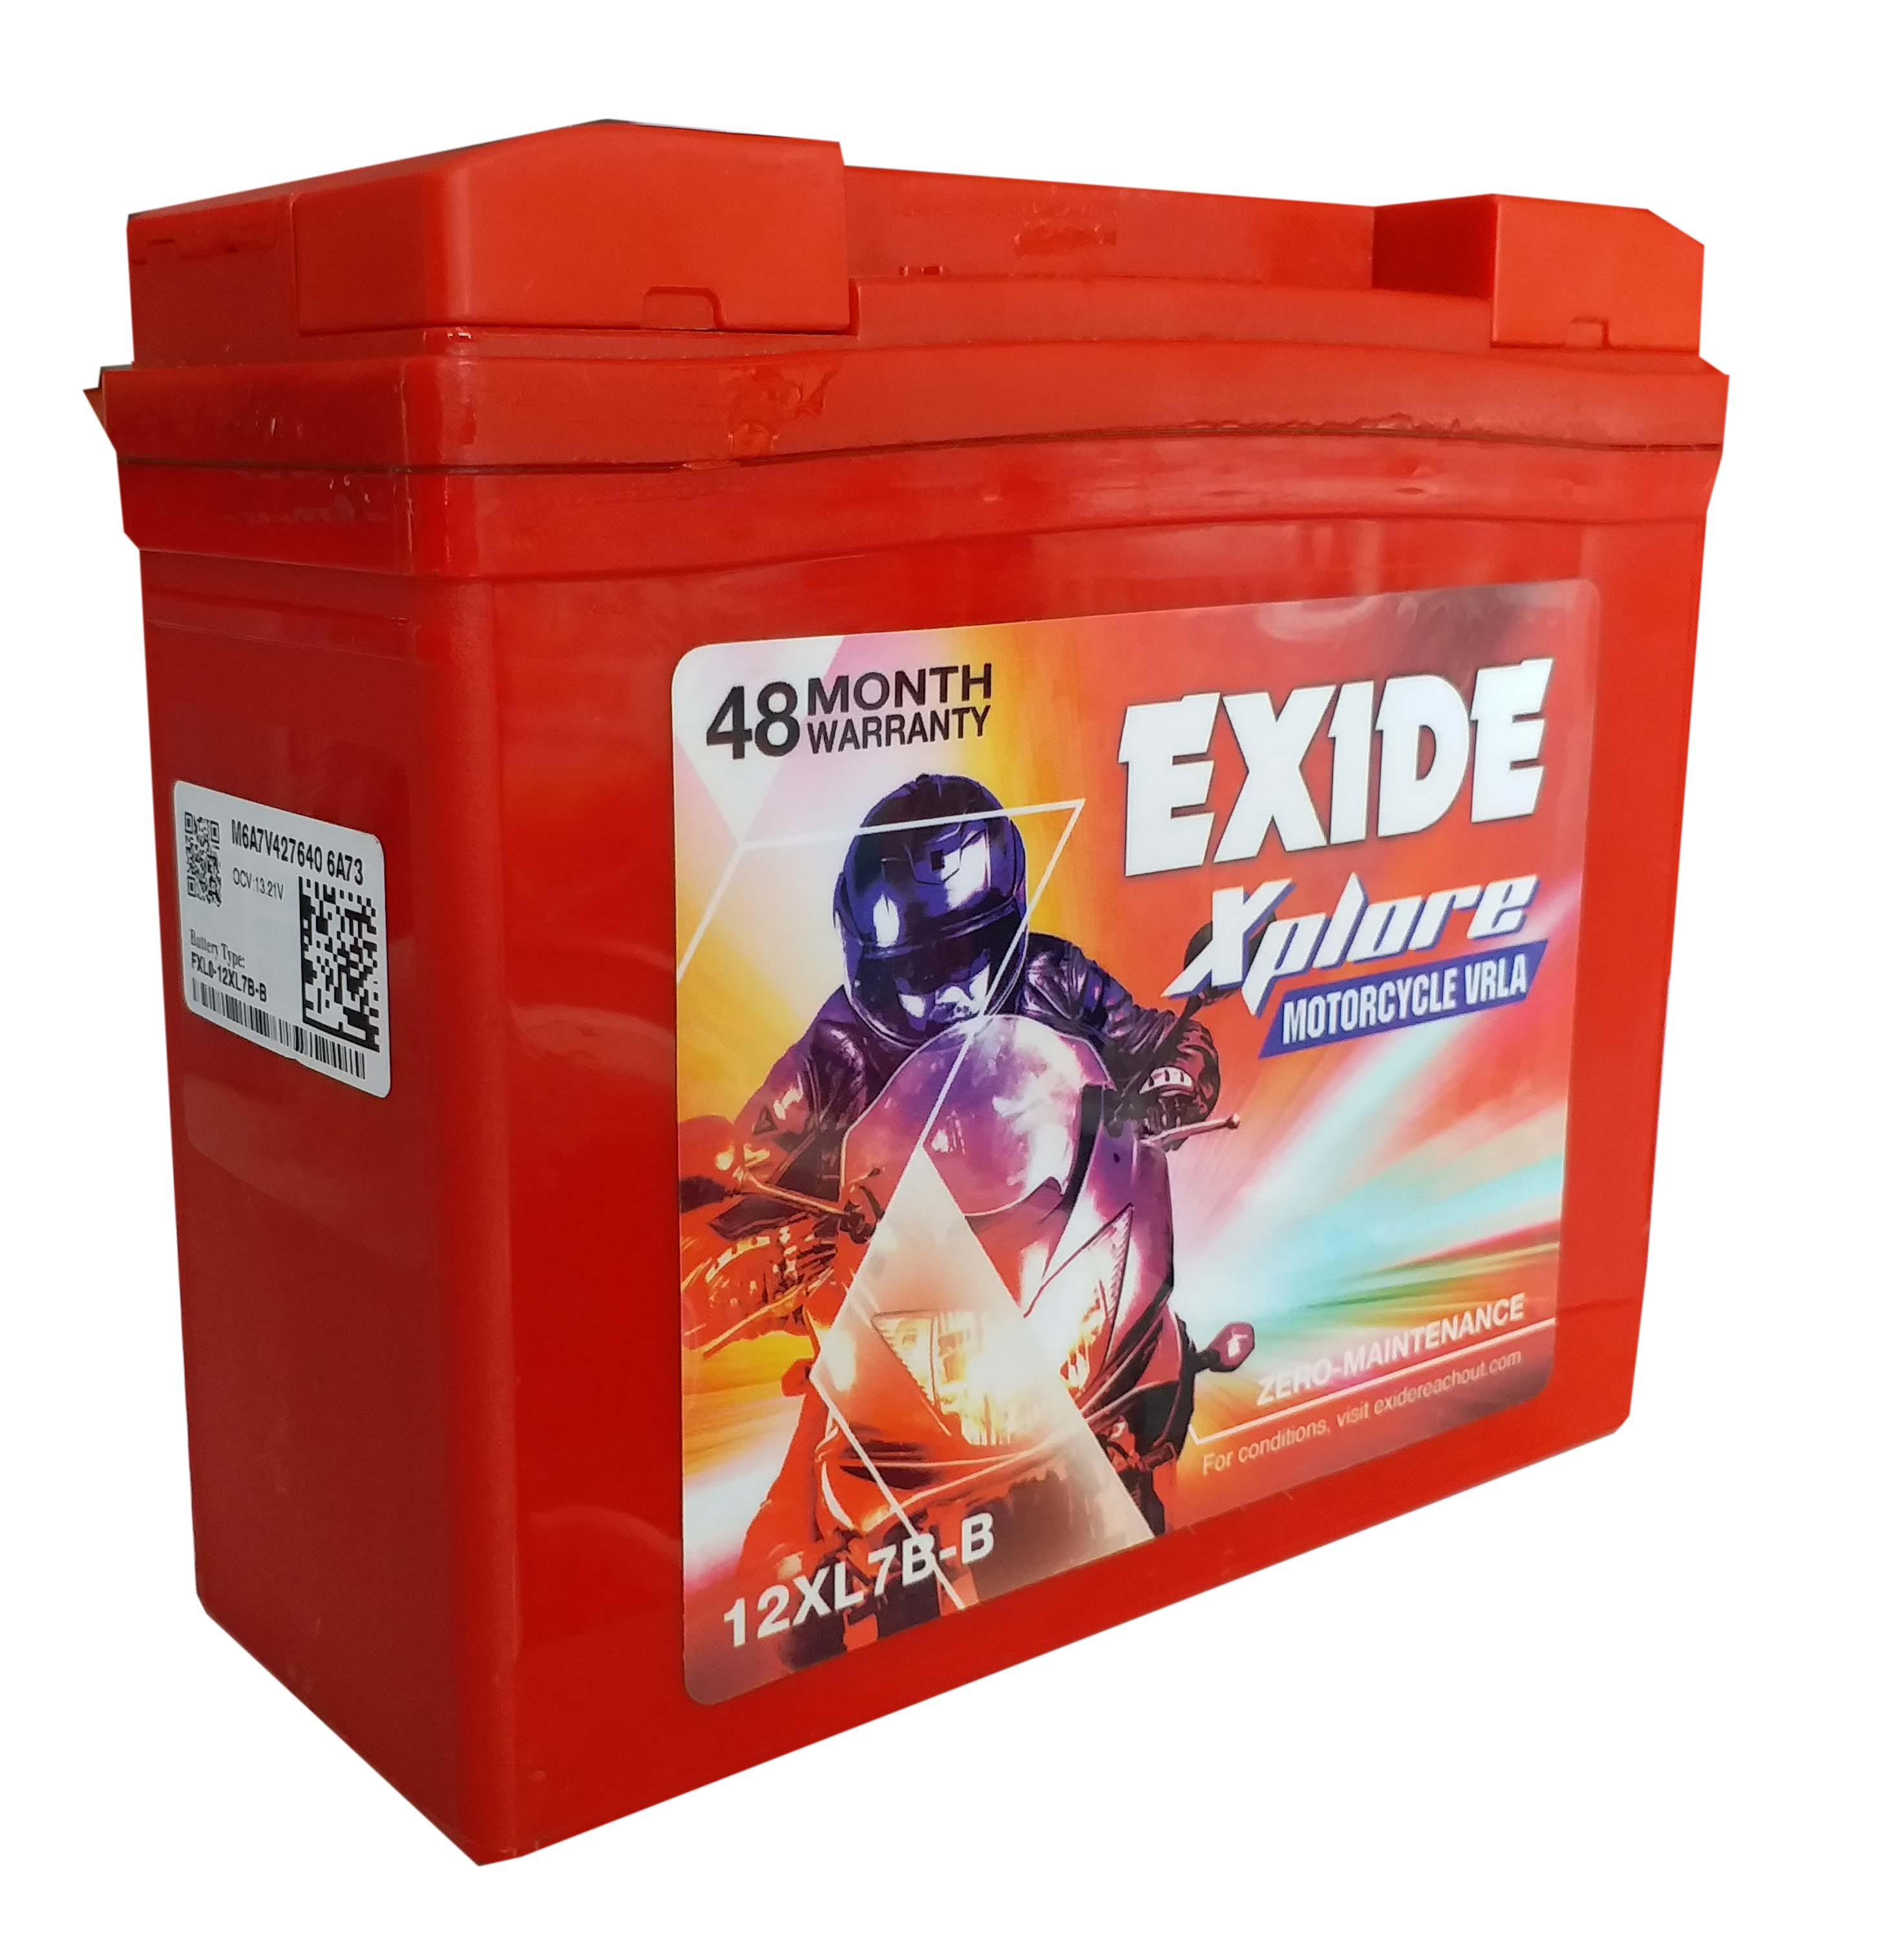 Exide xplore mahindra duro , rodeo , discover 150 , pulsor 150 new model BATTERY 12xl7b-b